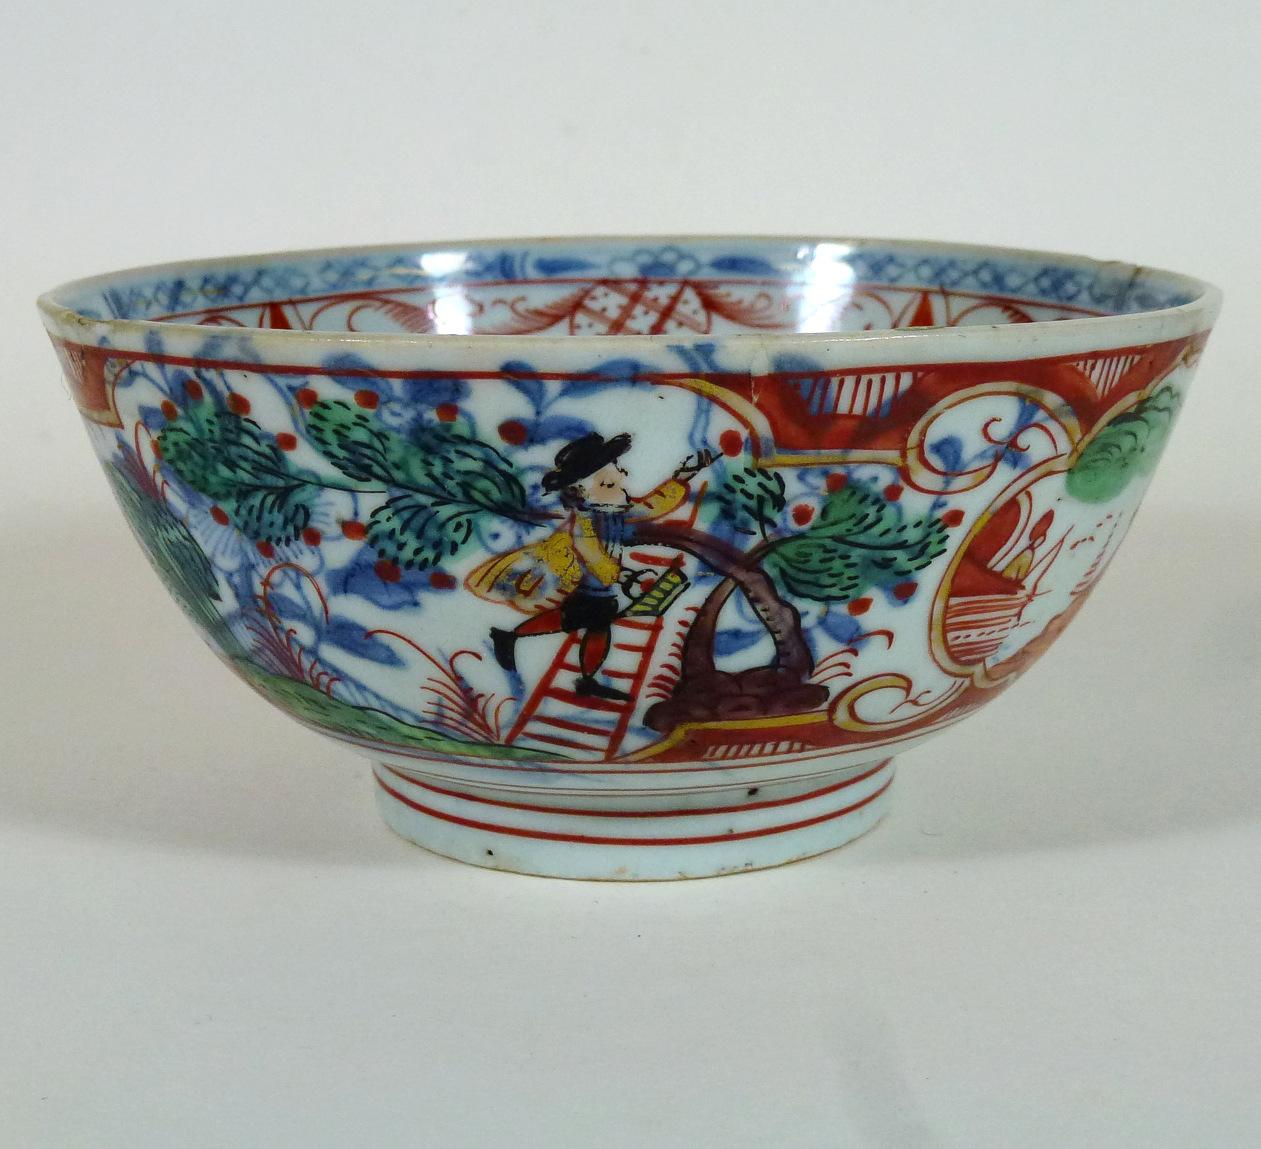 "Chinese 18th C. Bowl ""Amsterdam Bont"" – Cherry Pickers"